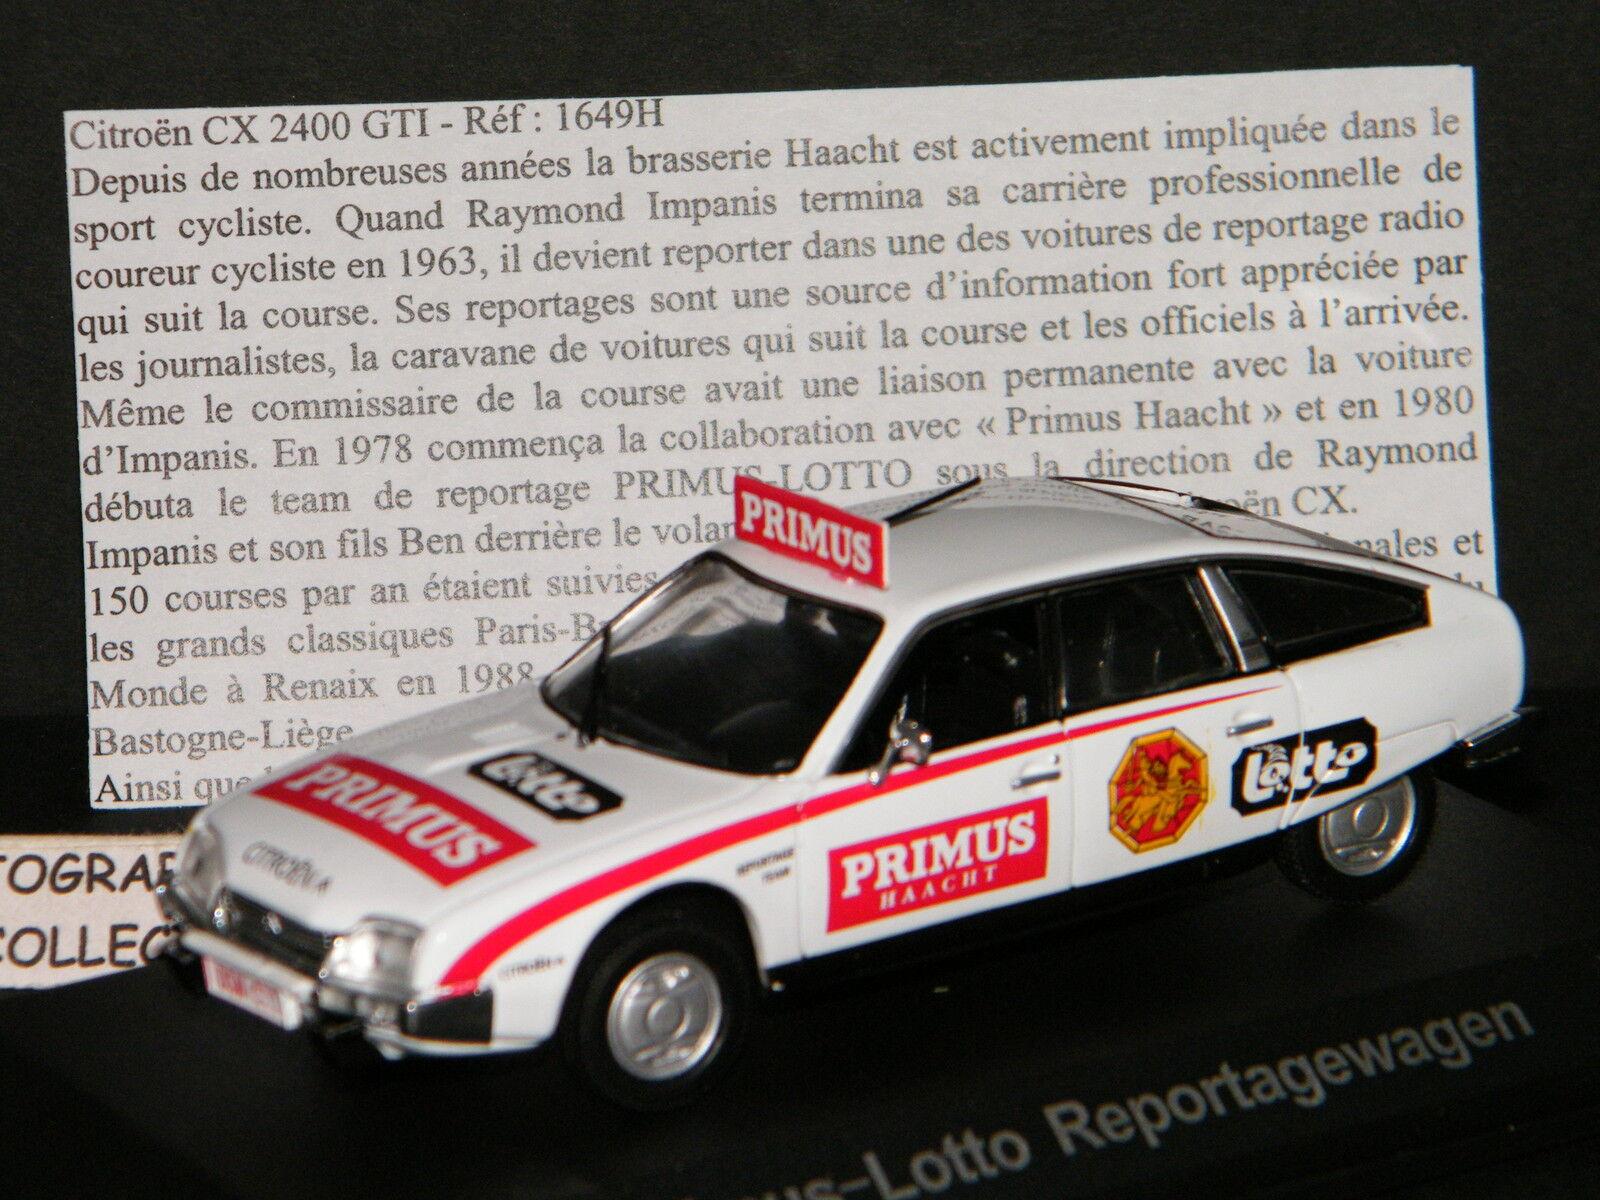 Senza tasse CITROEN CX 2400 GTI PRIMUS-LOTTO REPORTAGEWAGEN HAACHT HAACHT HAACHT - UNIVERSAL HOBBIES 1 43è  vendita calda